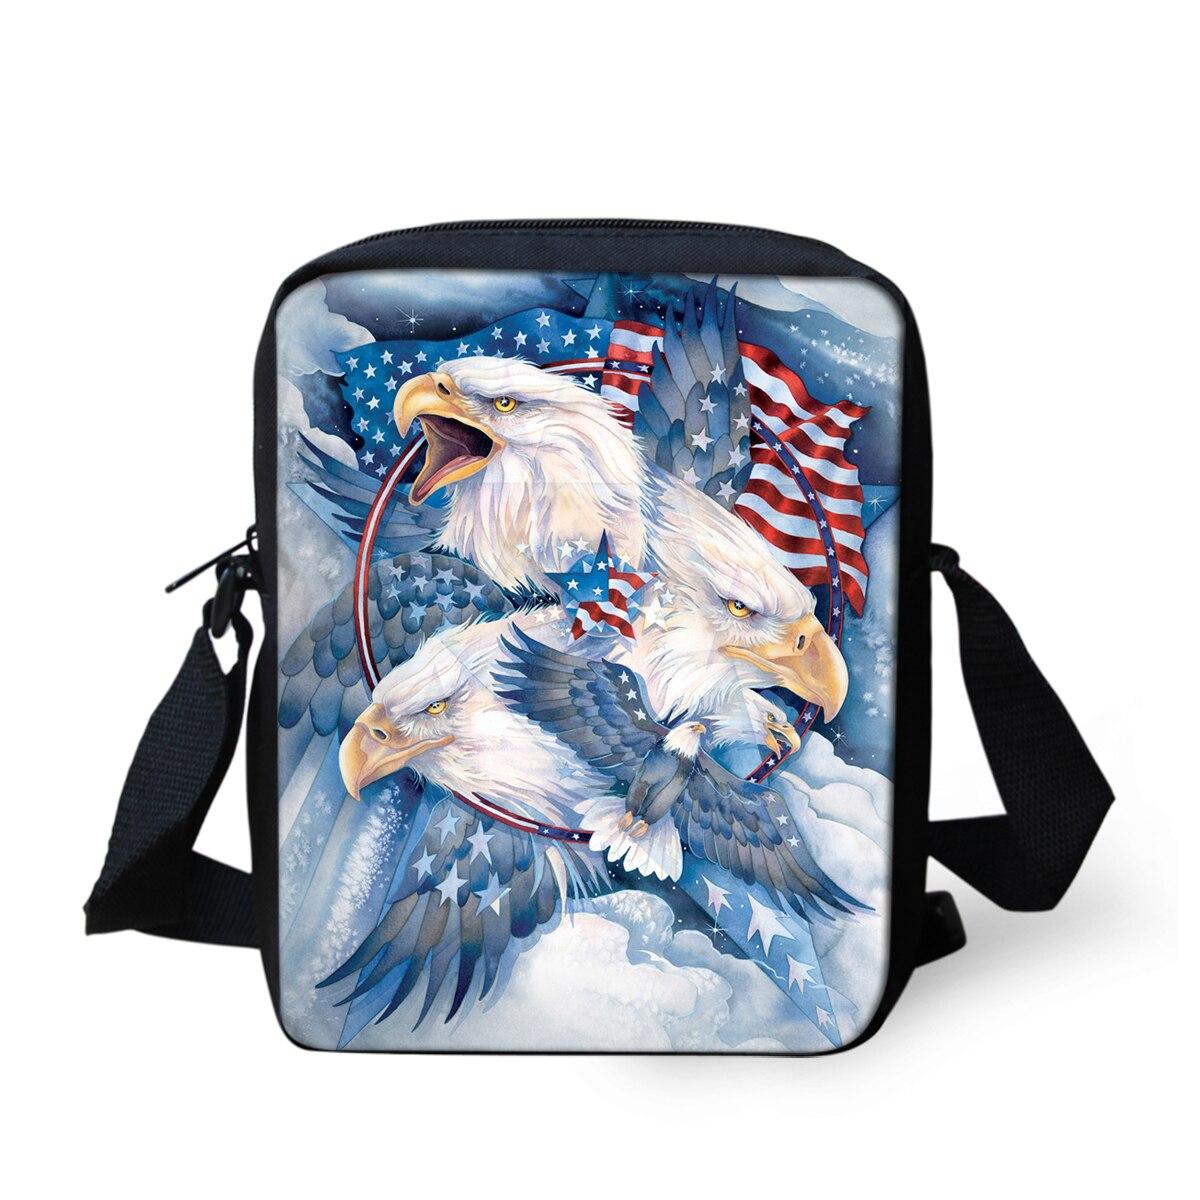 THIKIN, bolsos de mensajero para niñas, estilo Animal americano, Mini bolsos cruzados de viaje para niños, mochila escolar ligera, bolso de hombro